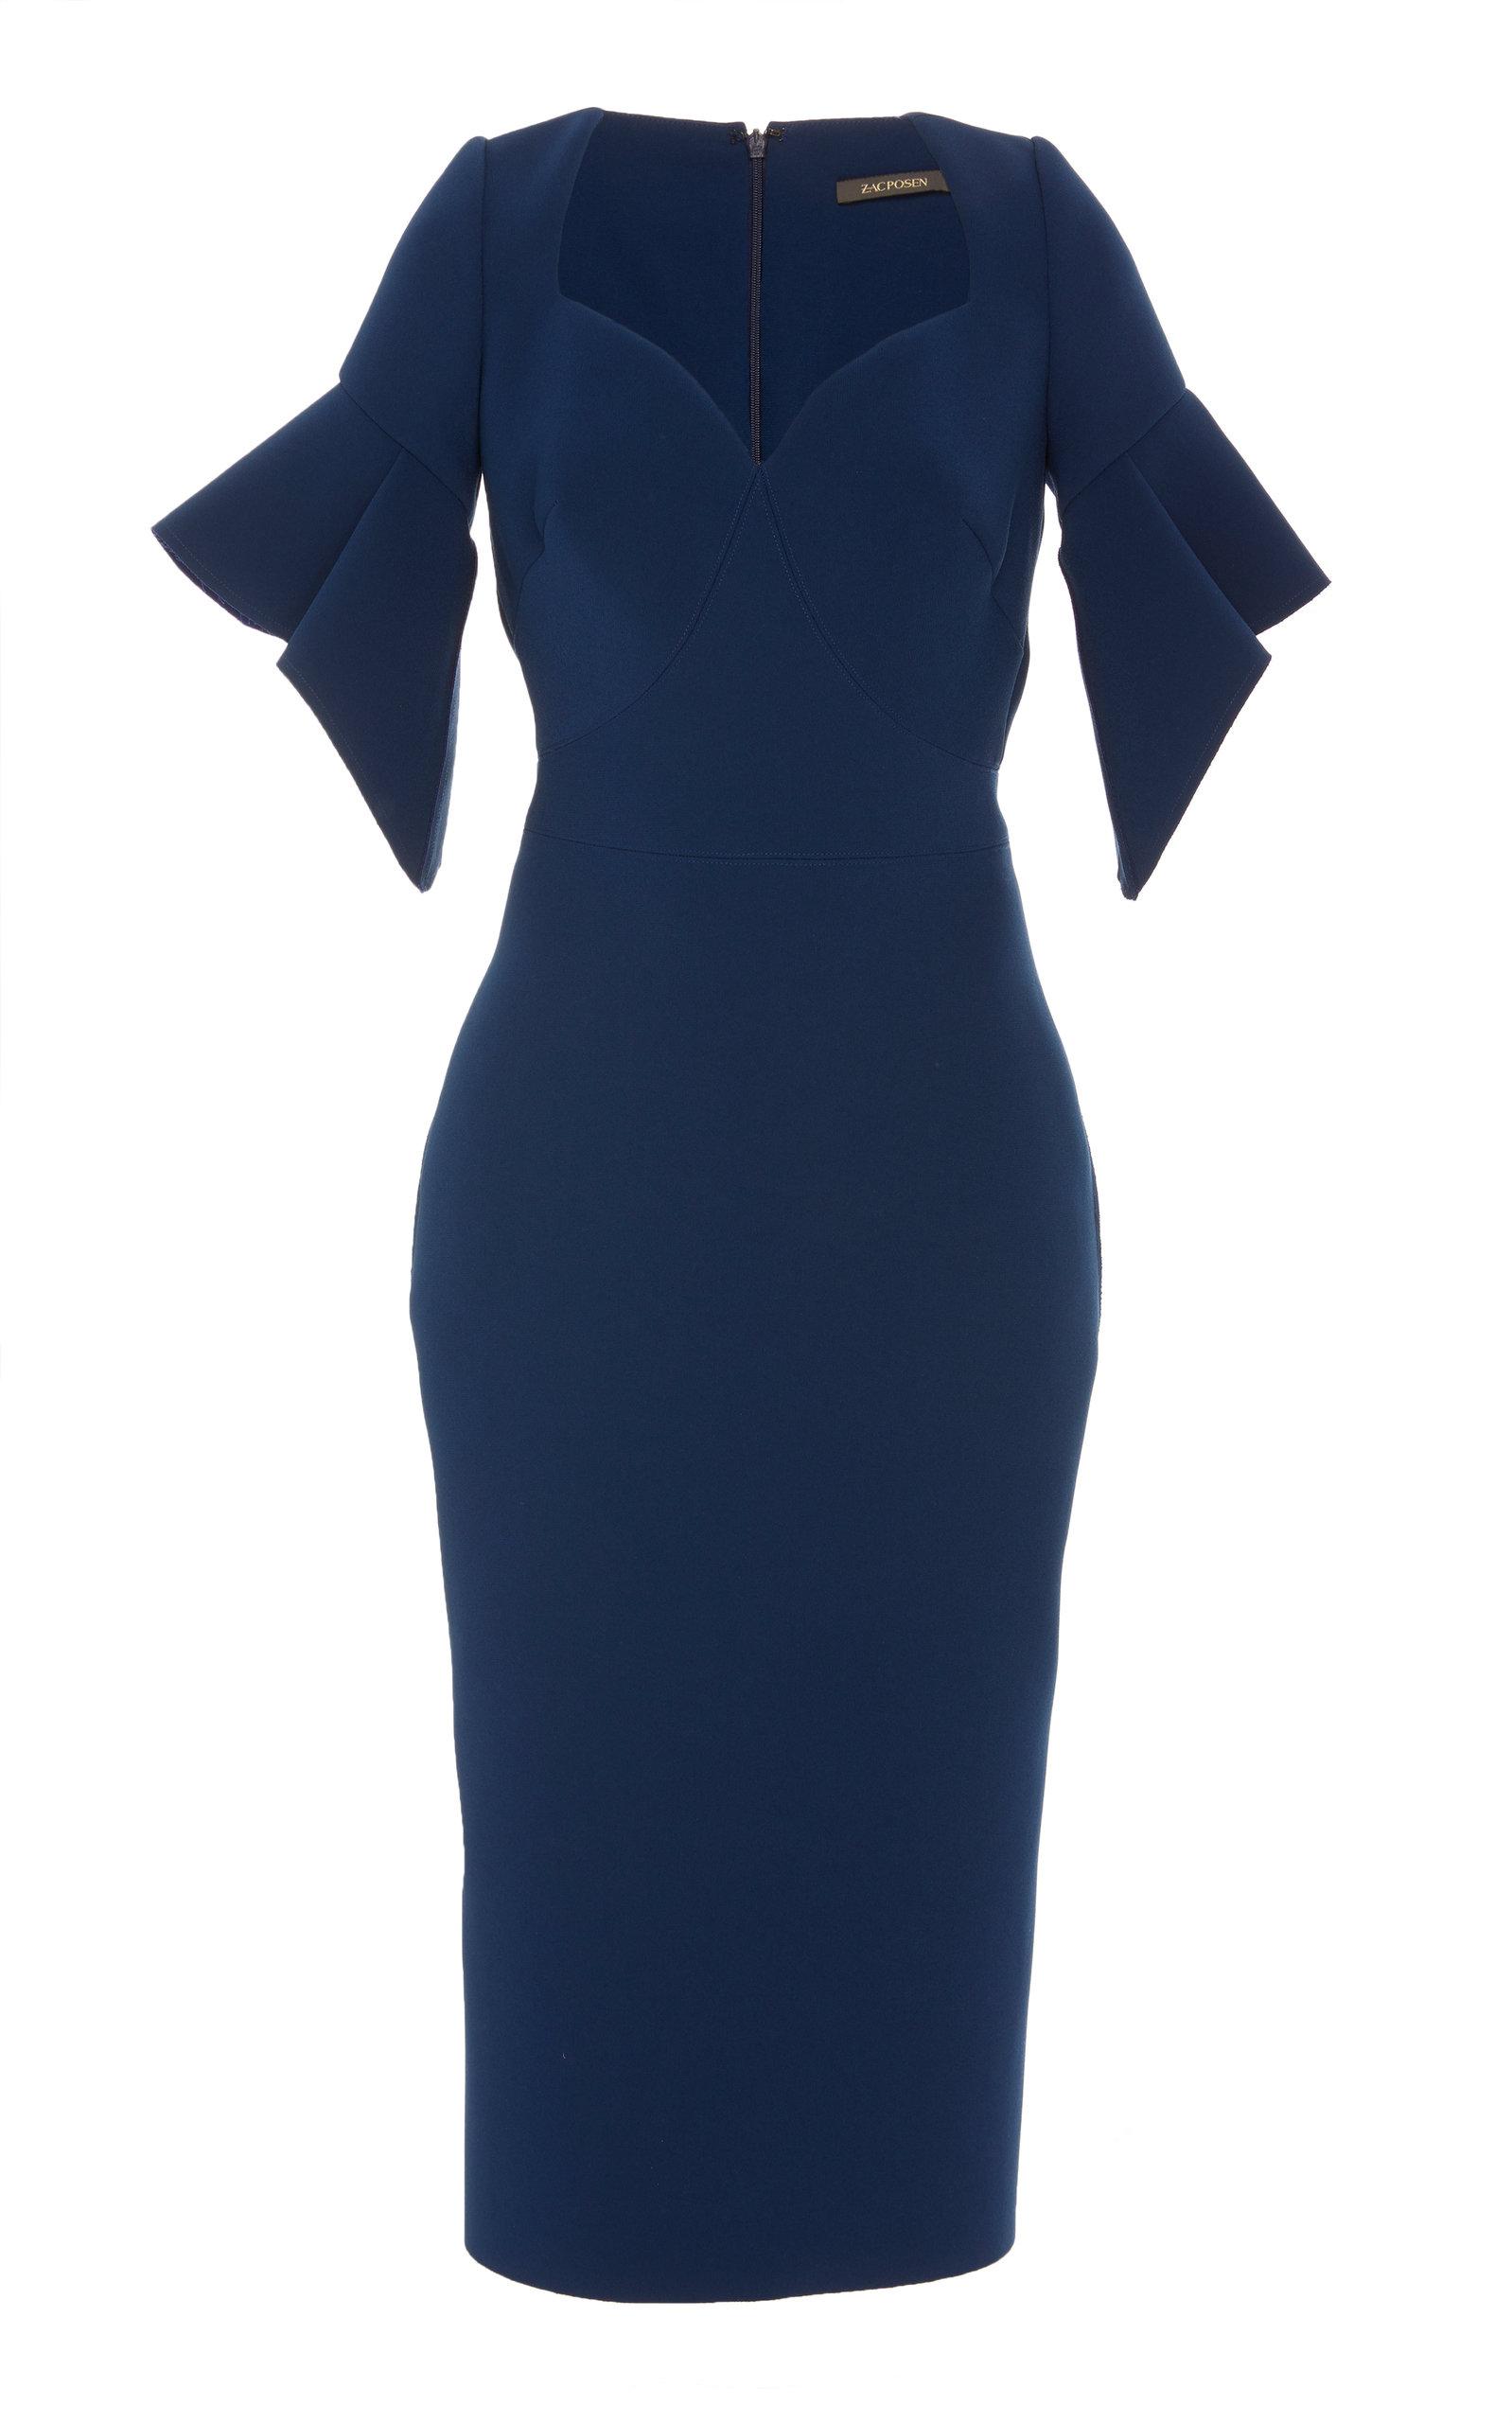 Buy Zac Posen Ruffled Sleeve Cady Midi Dress online, shop Zac Posen at the best price